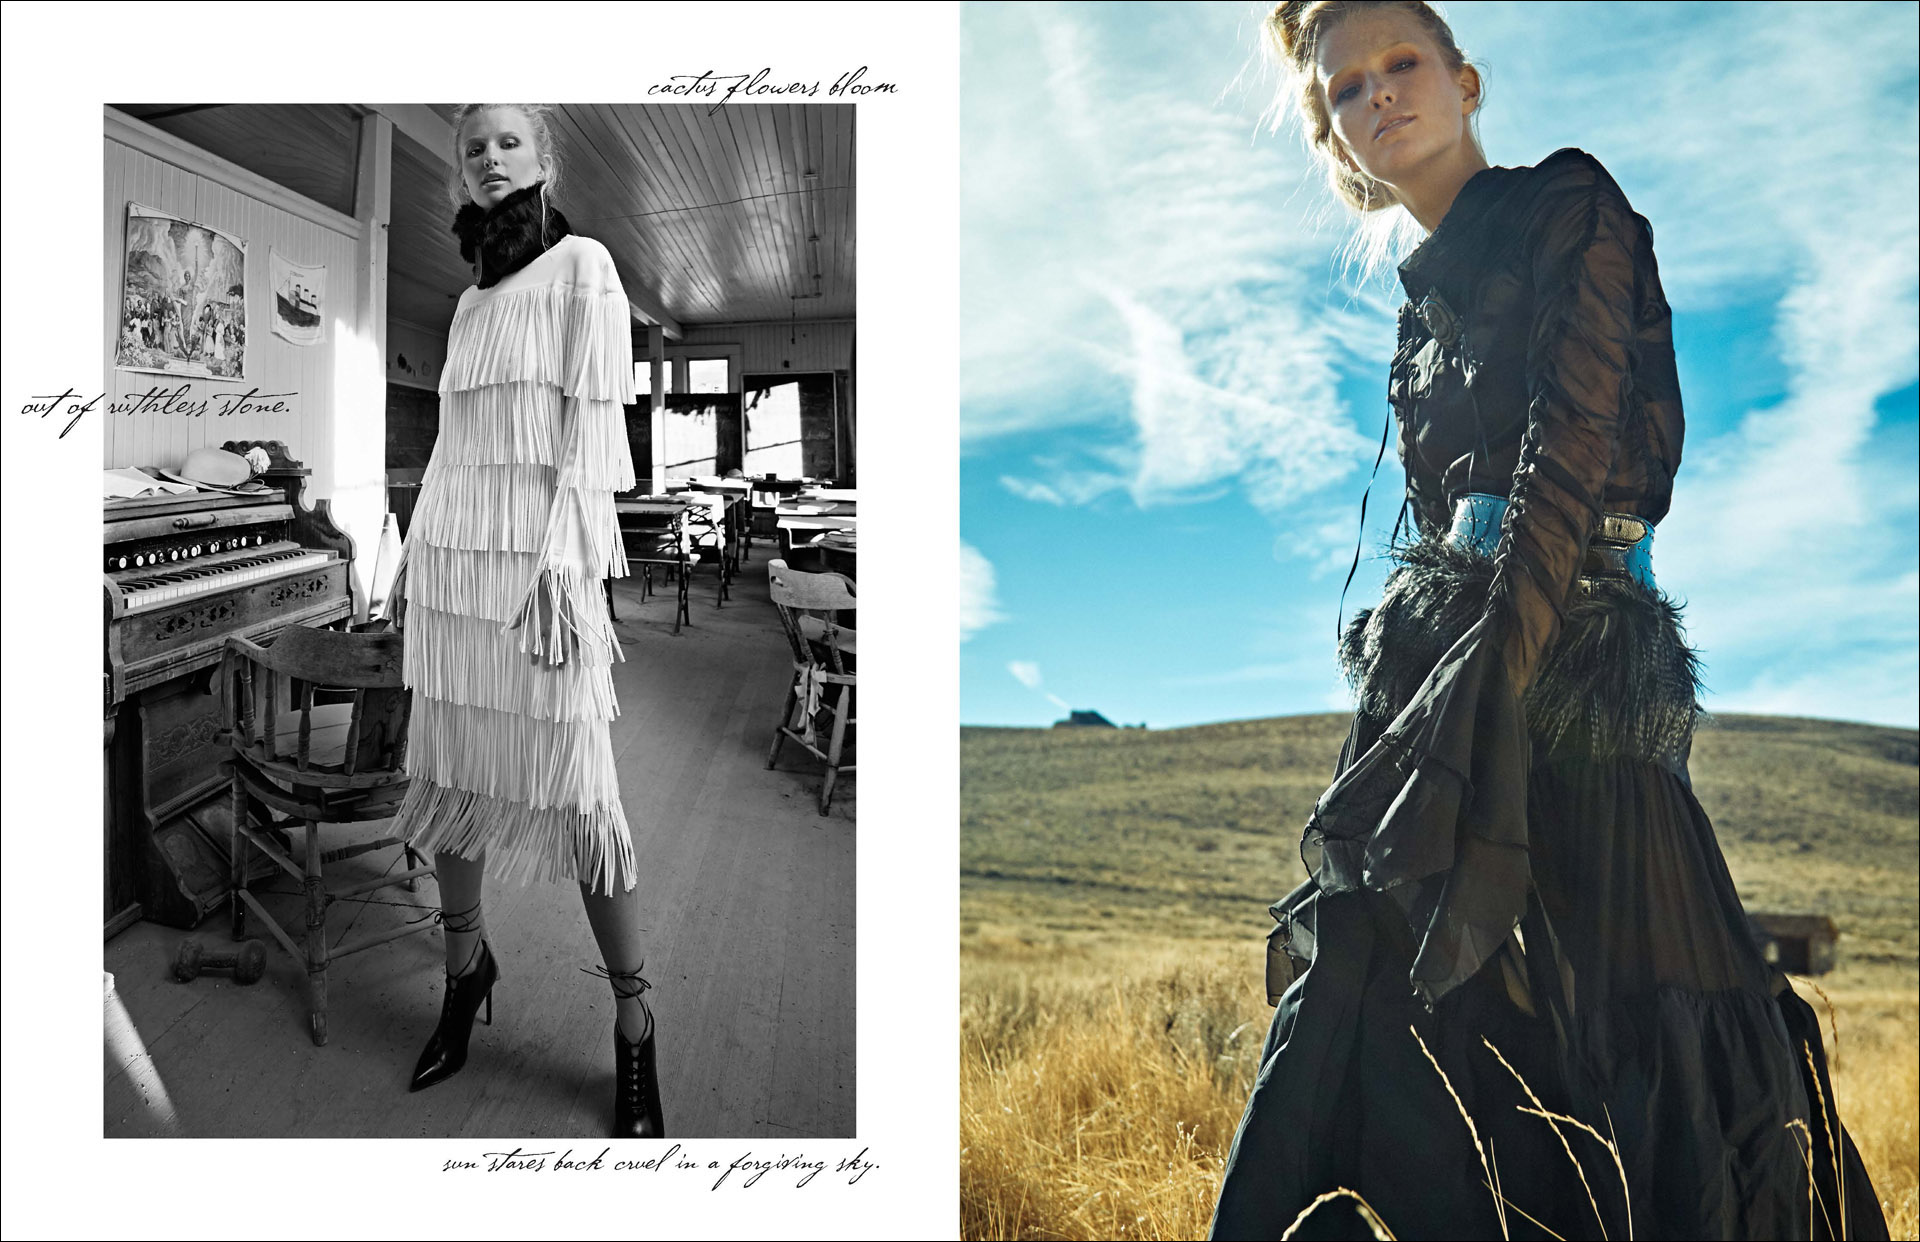 Spirit-&-Flesh-Magazine_LAS-DESPERADAS_by_MEG-WEBSTER_and_ATHANASIA-NICHOLS_004